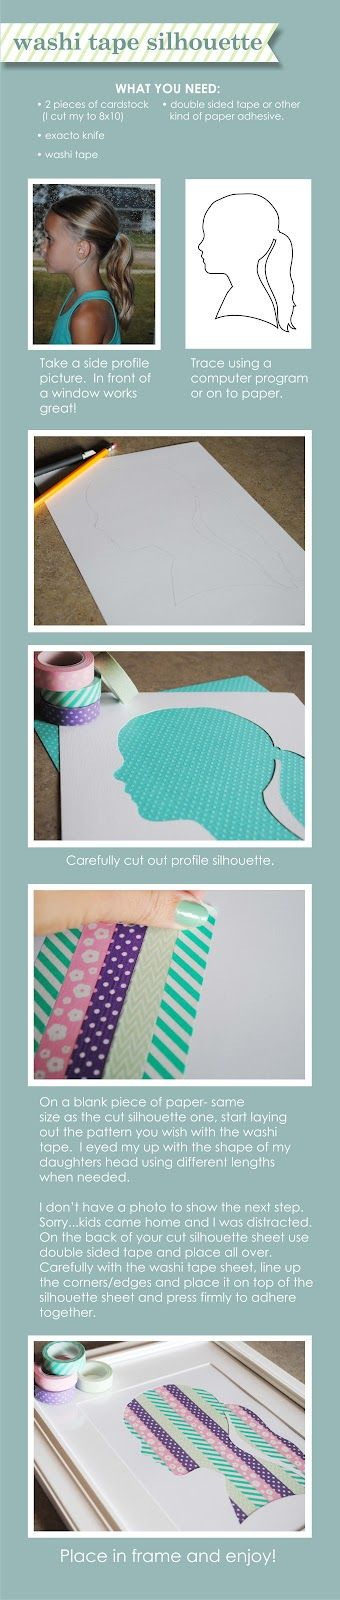 Winks & Daisies: DIY Washi Tape Silhoutte